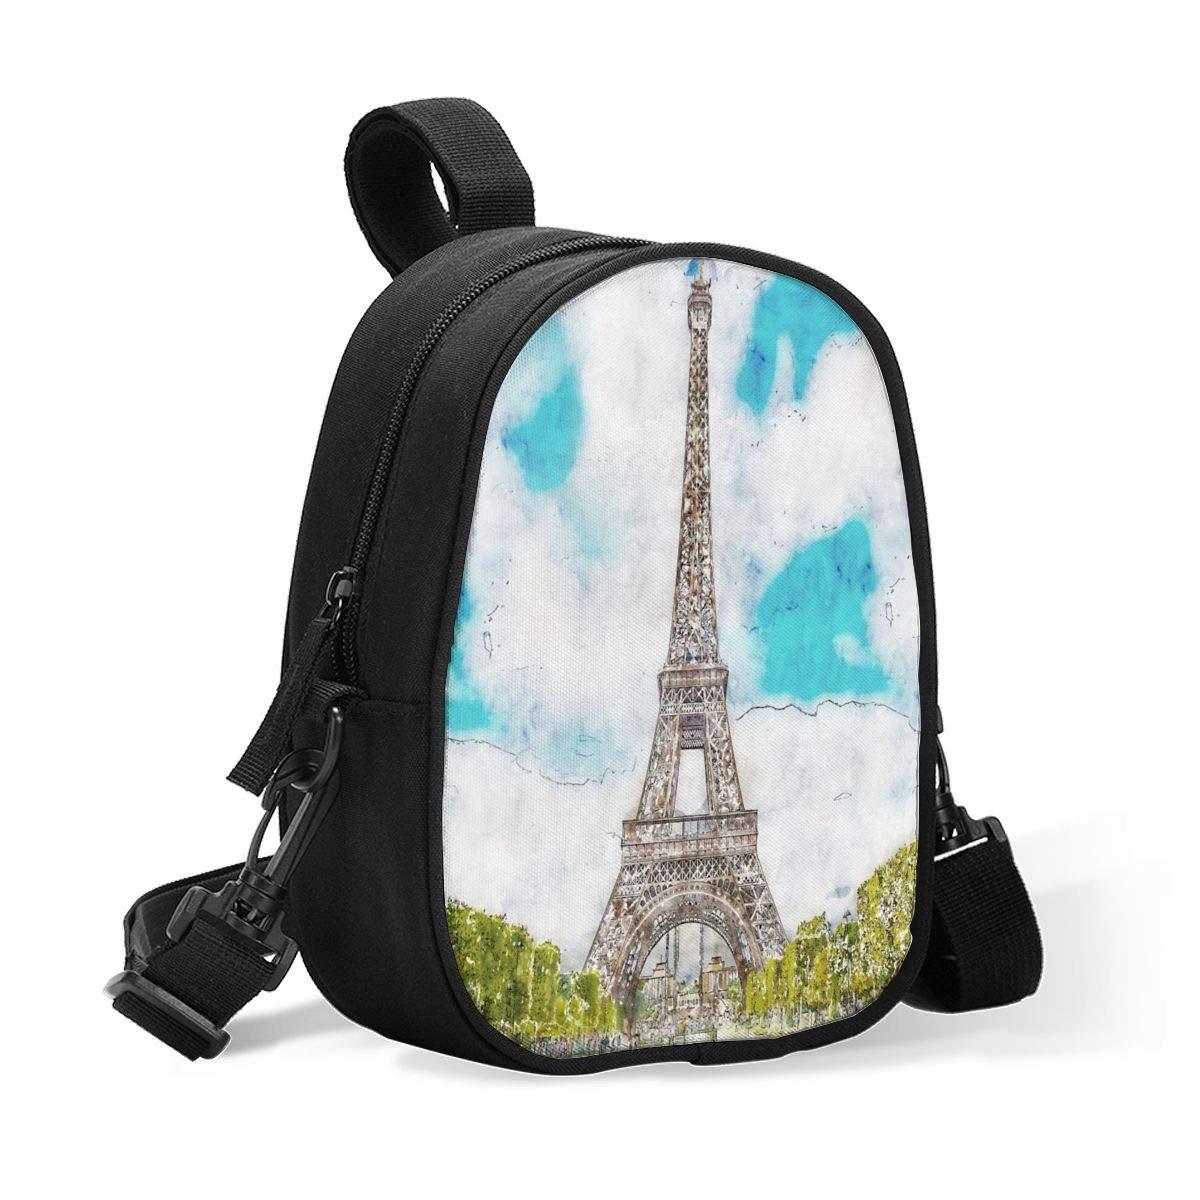 Breastmilk Cooler Bag Insulated Baby Bottle Bag Watercolor Landscape Paris Eiffel Tower Reusable Baby Bottle Warmer Tote Bag Handbag Lunch Bag Box for 2 Large Bottles for Nursing Mom, Stroller